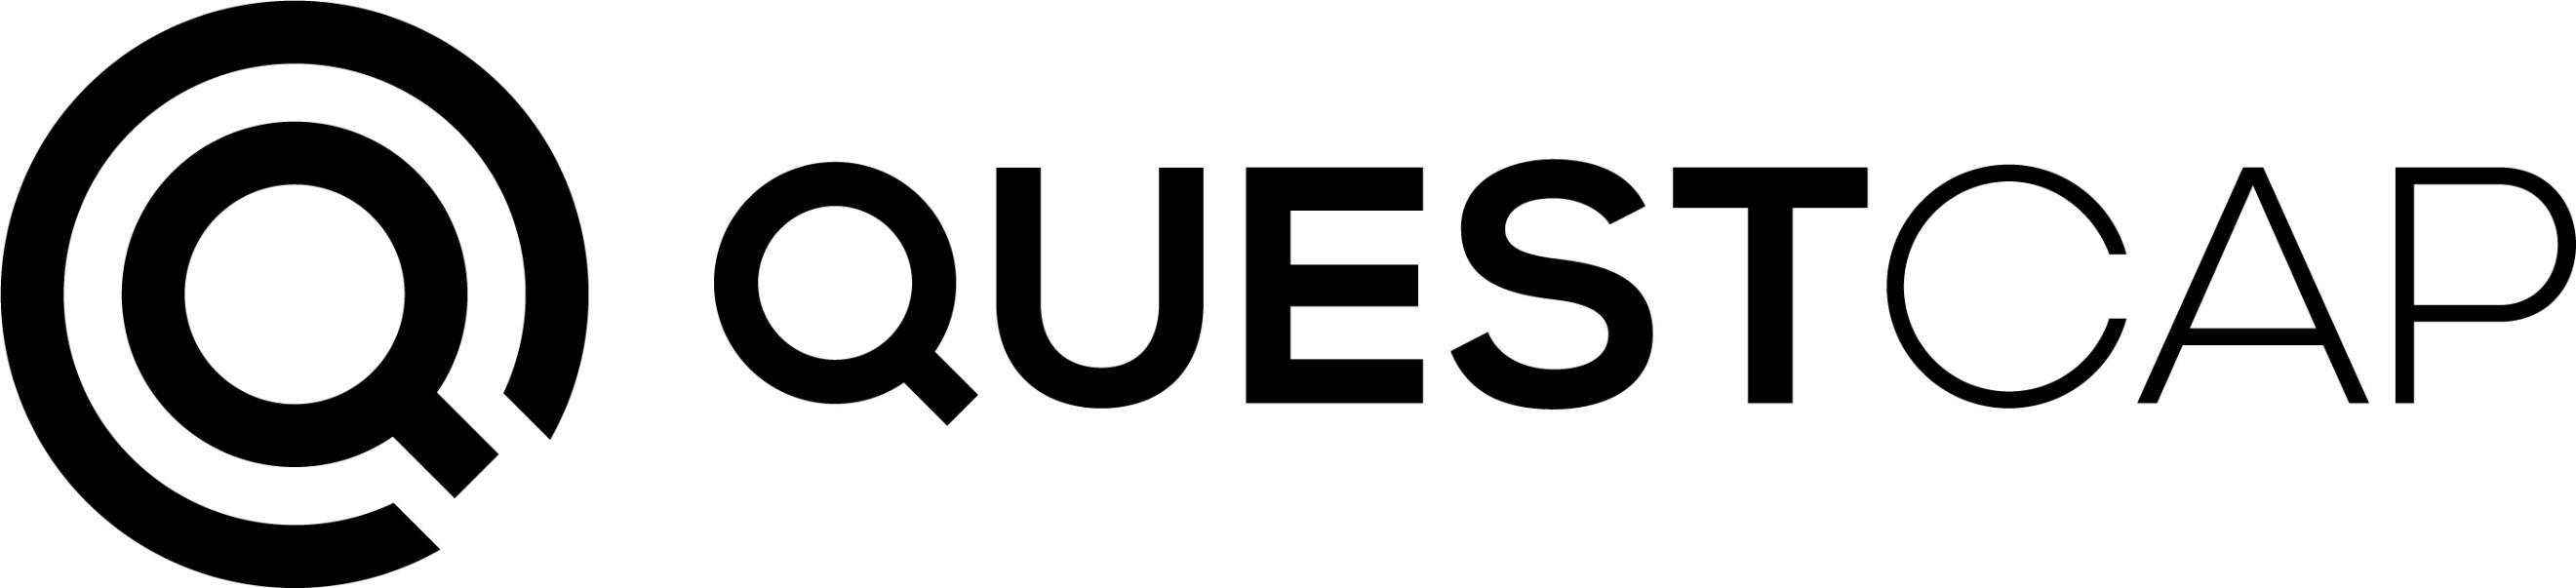 QuestCap Appoints Douglas Sommerville as President of MedQuest Investment Division